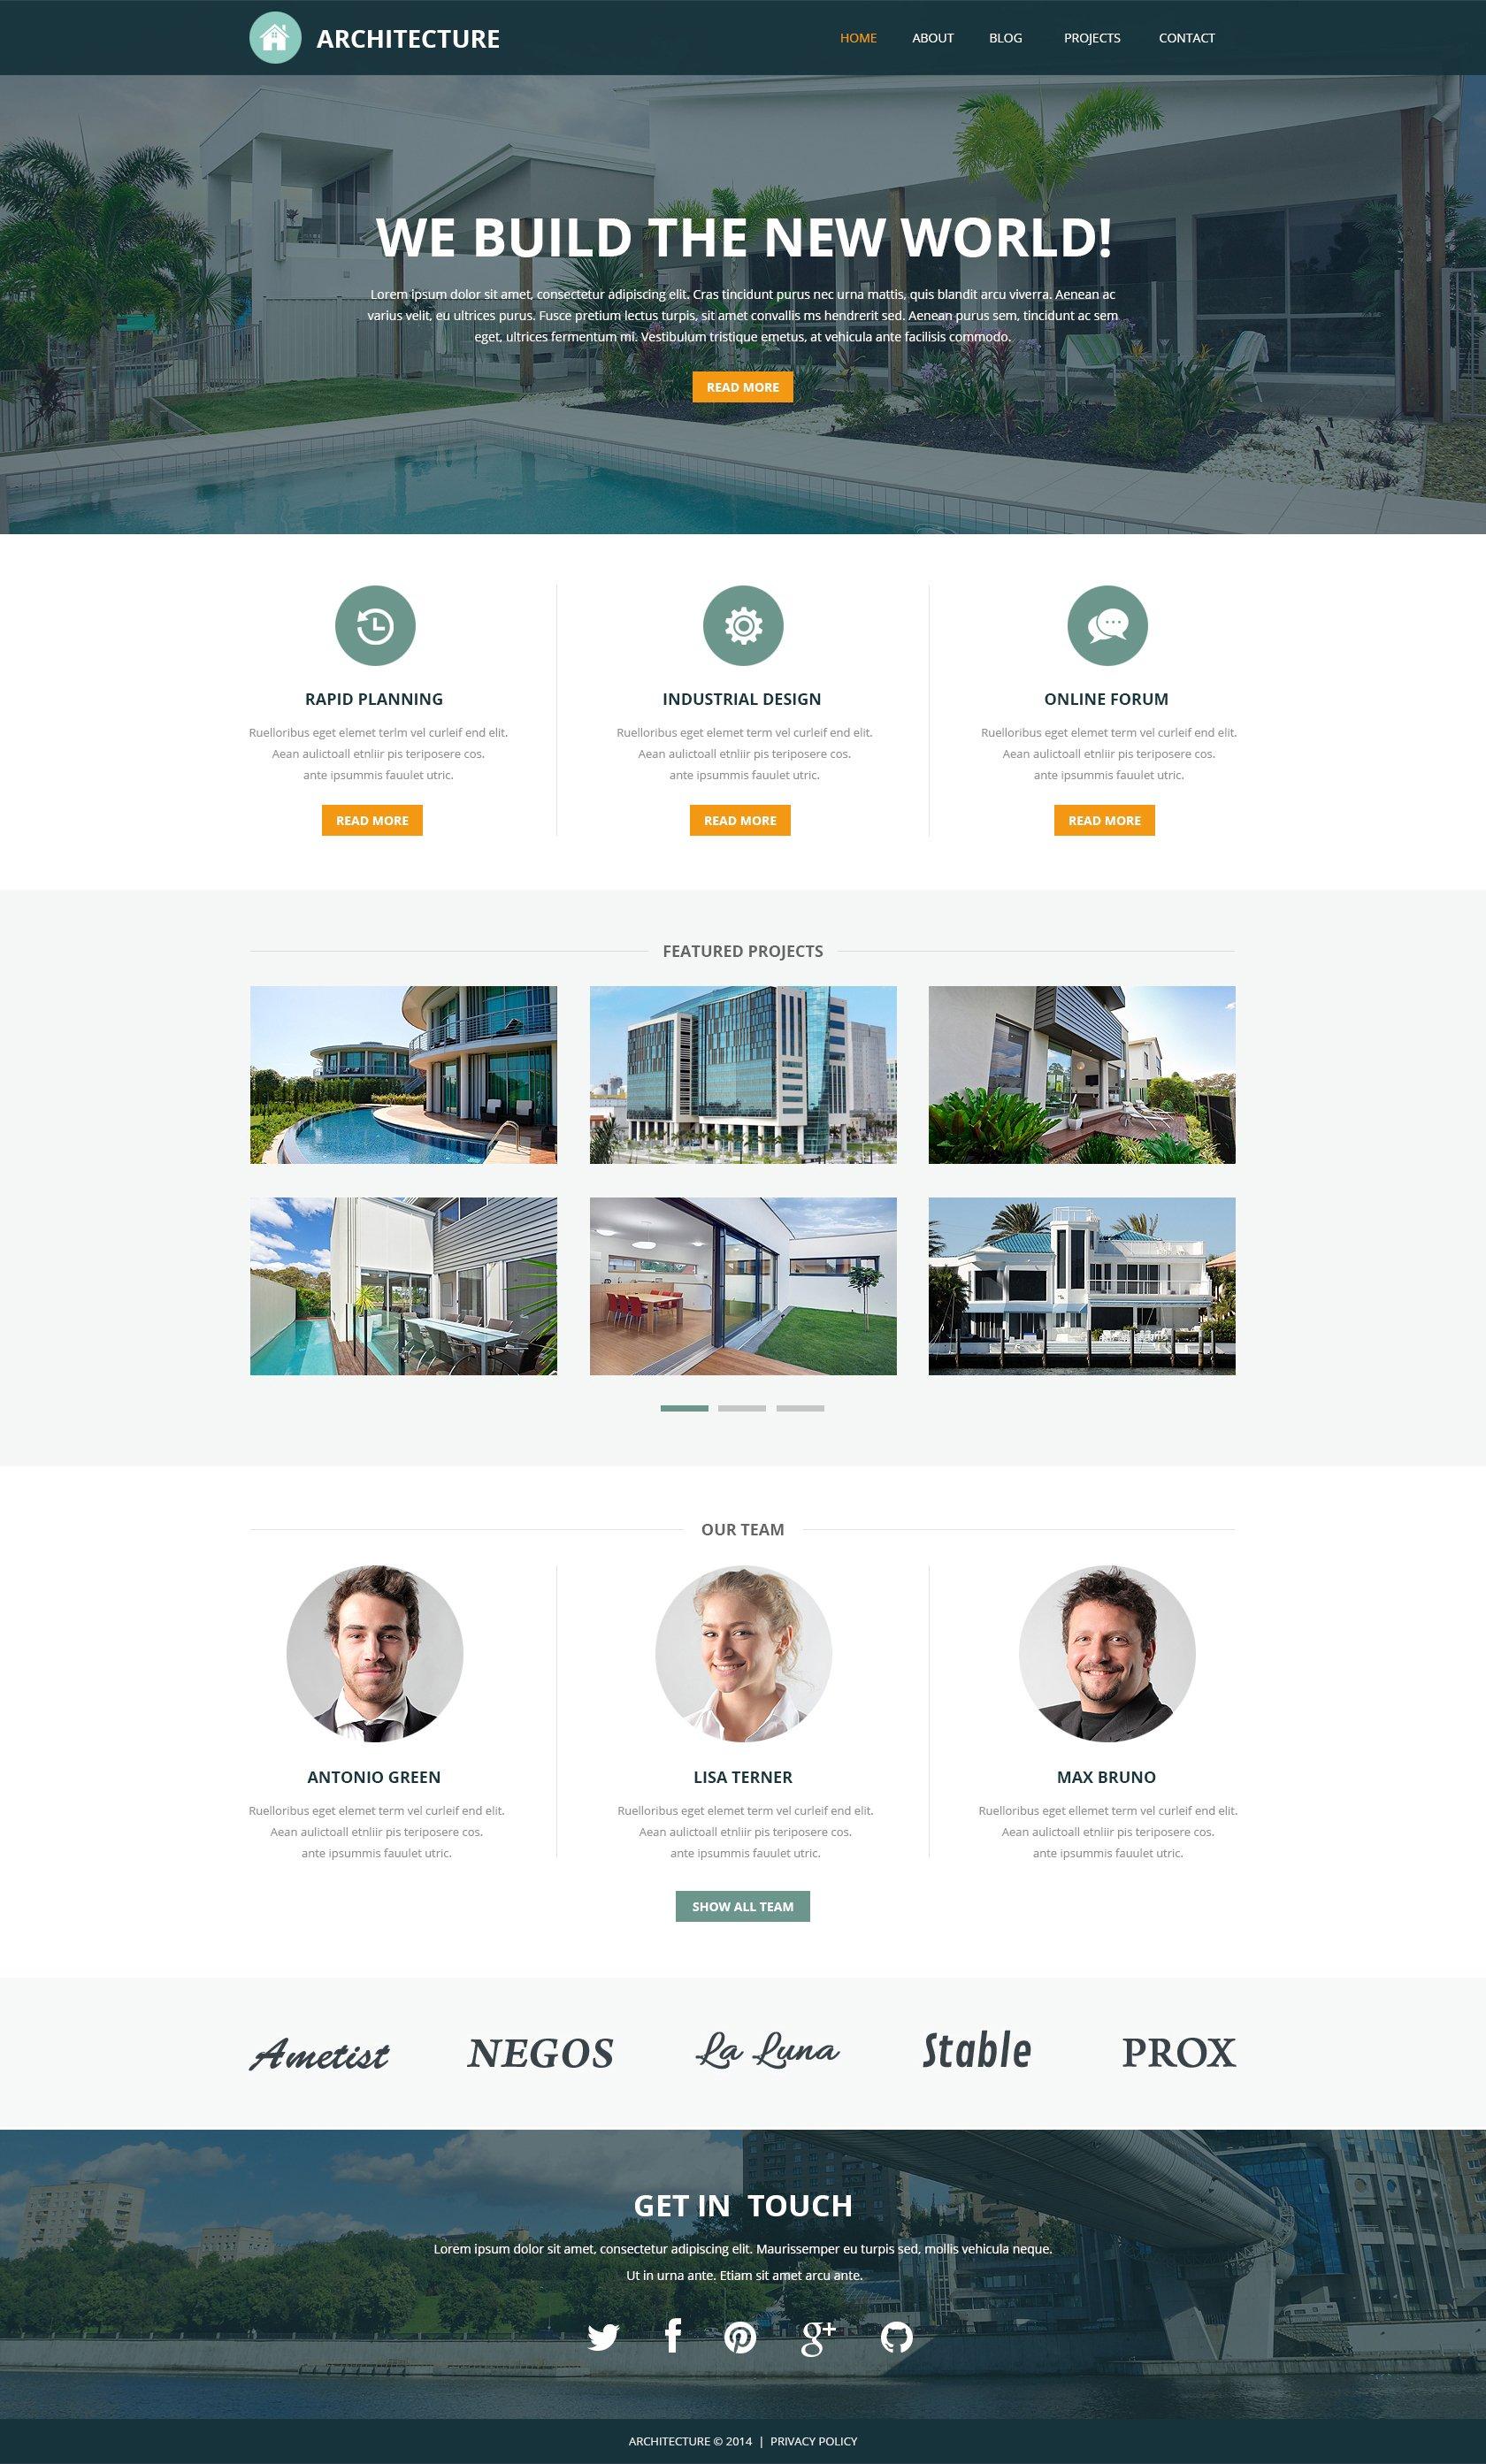 Pro Architectural Designs Joomla Template - screenshot